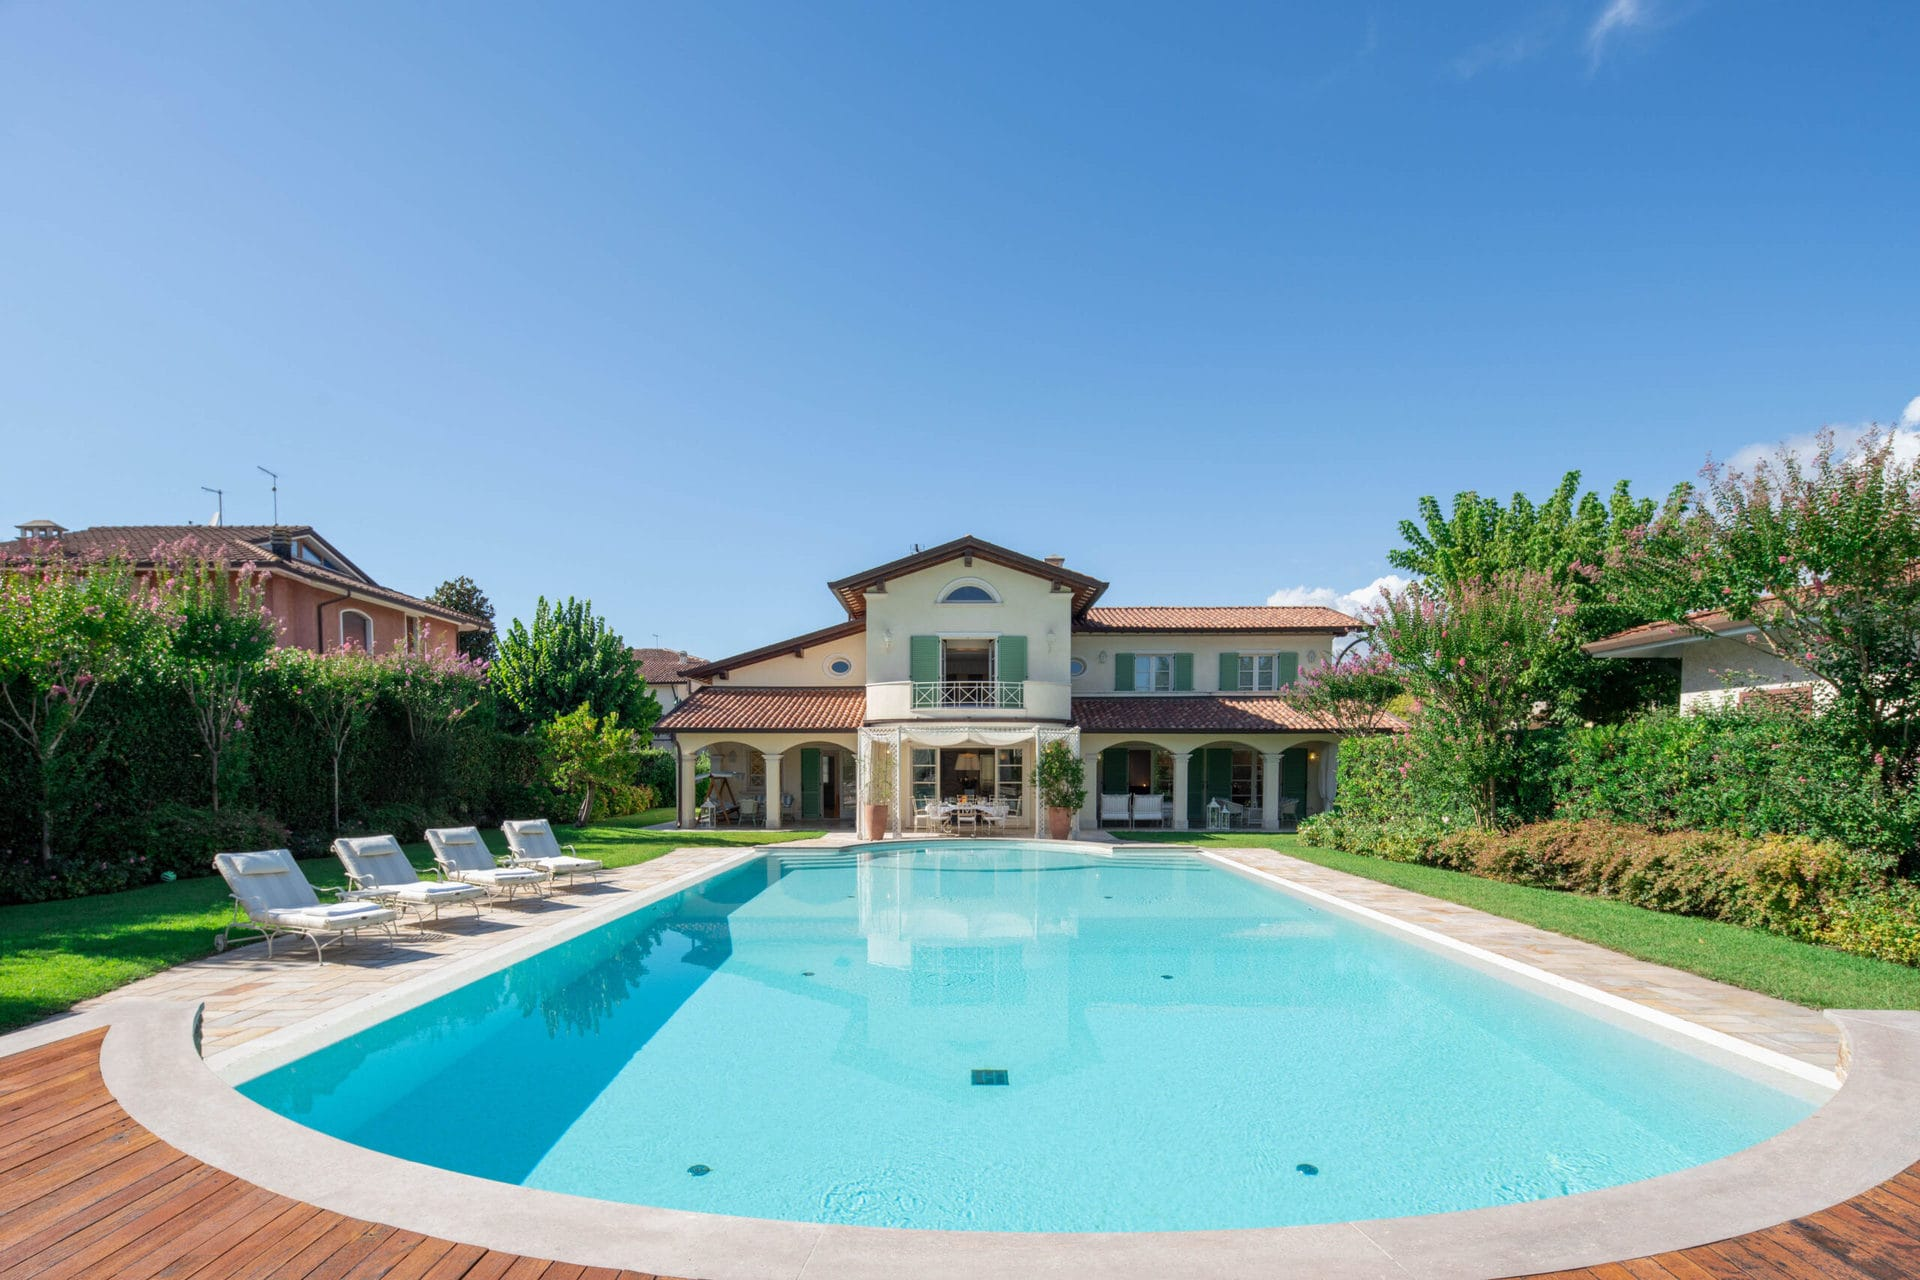 front villa view from garden - Forte dei Marmi LUX